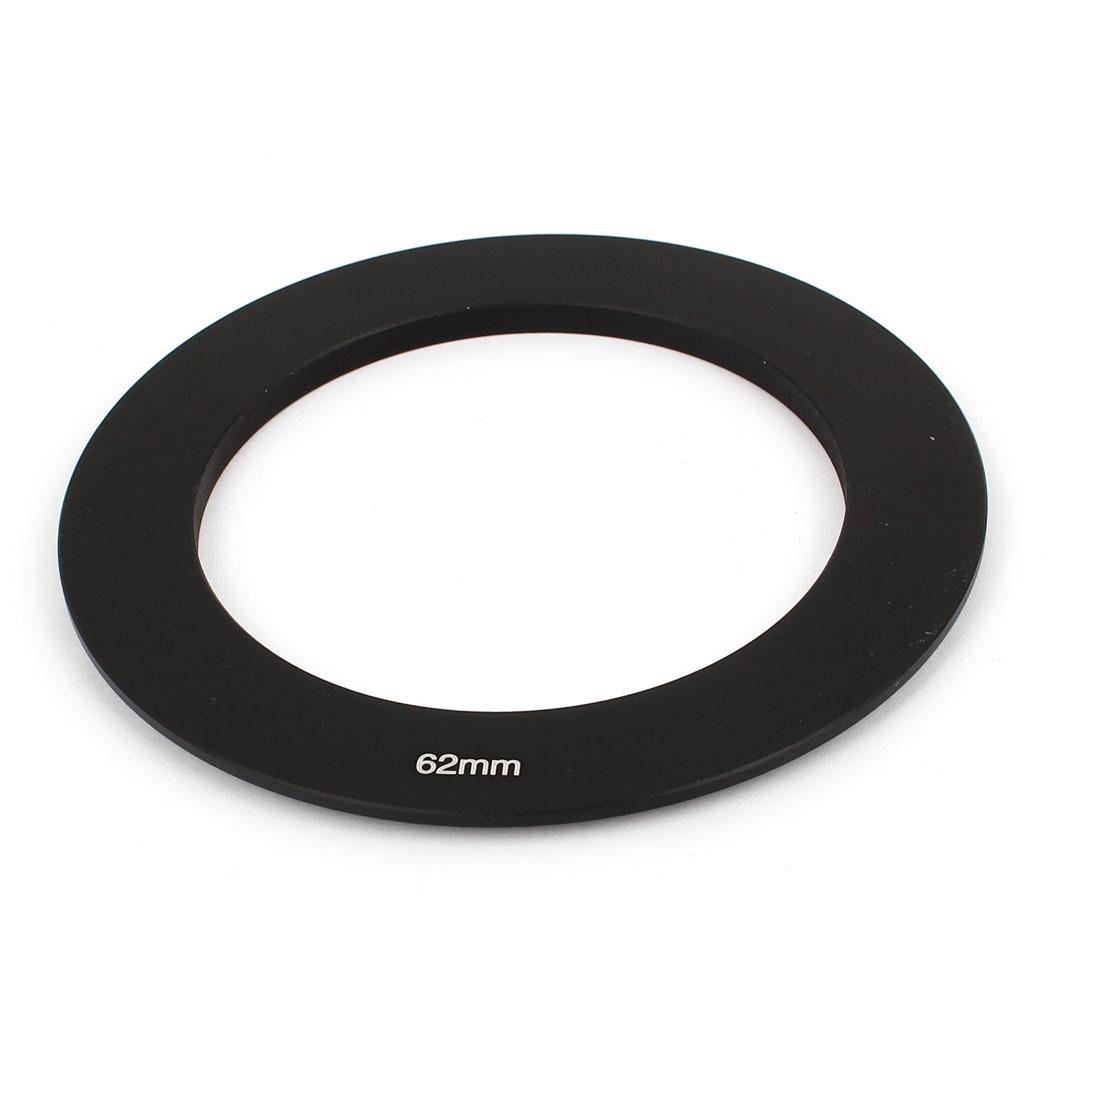 Camera Lens Filter Holder Aluminum Adapter Ring Black 62mm for Cokin P Series